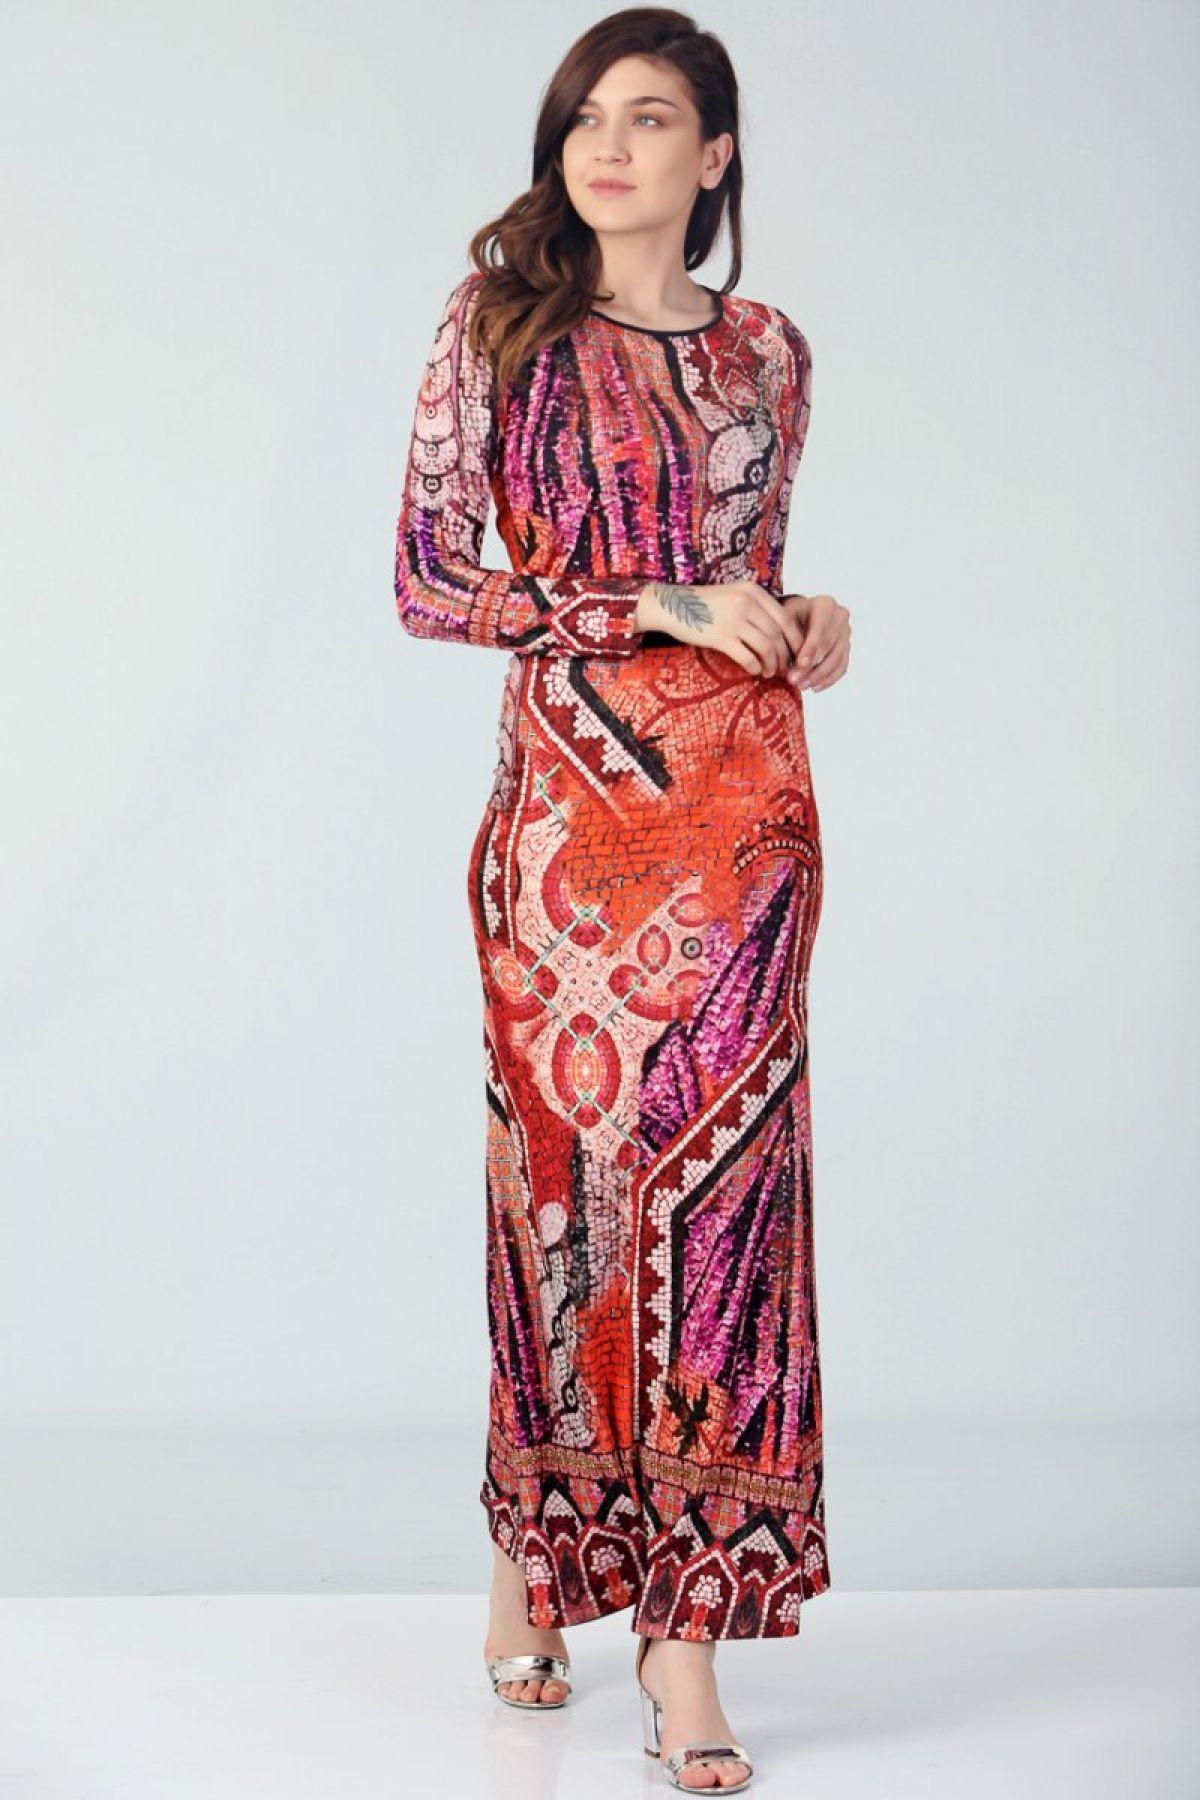 Dresses-Multi color